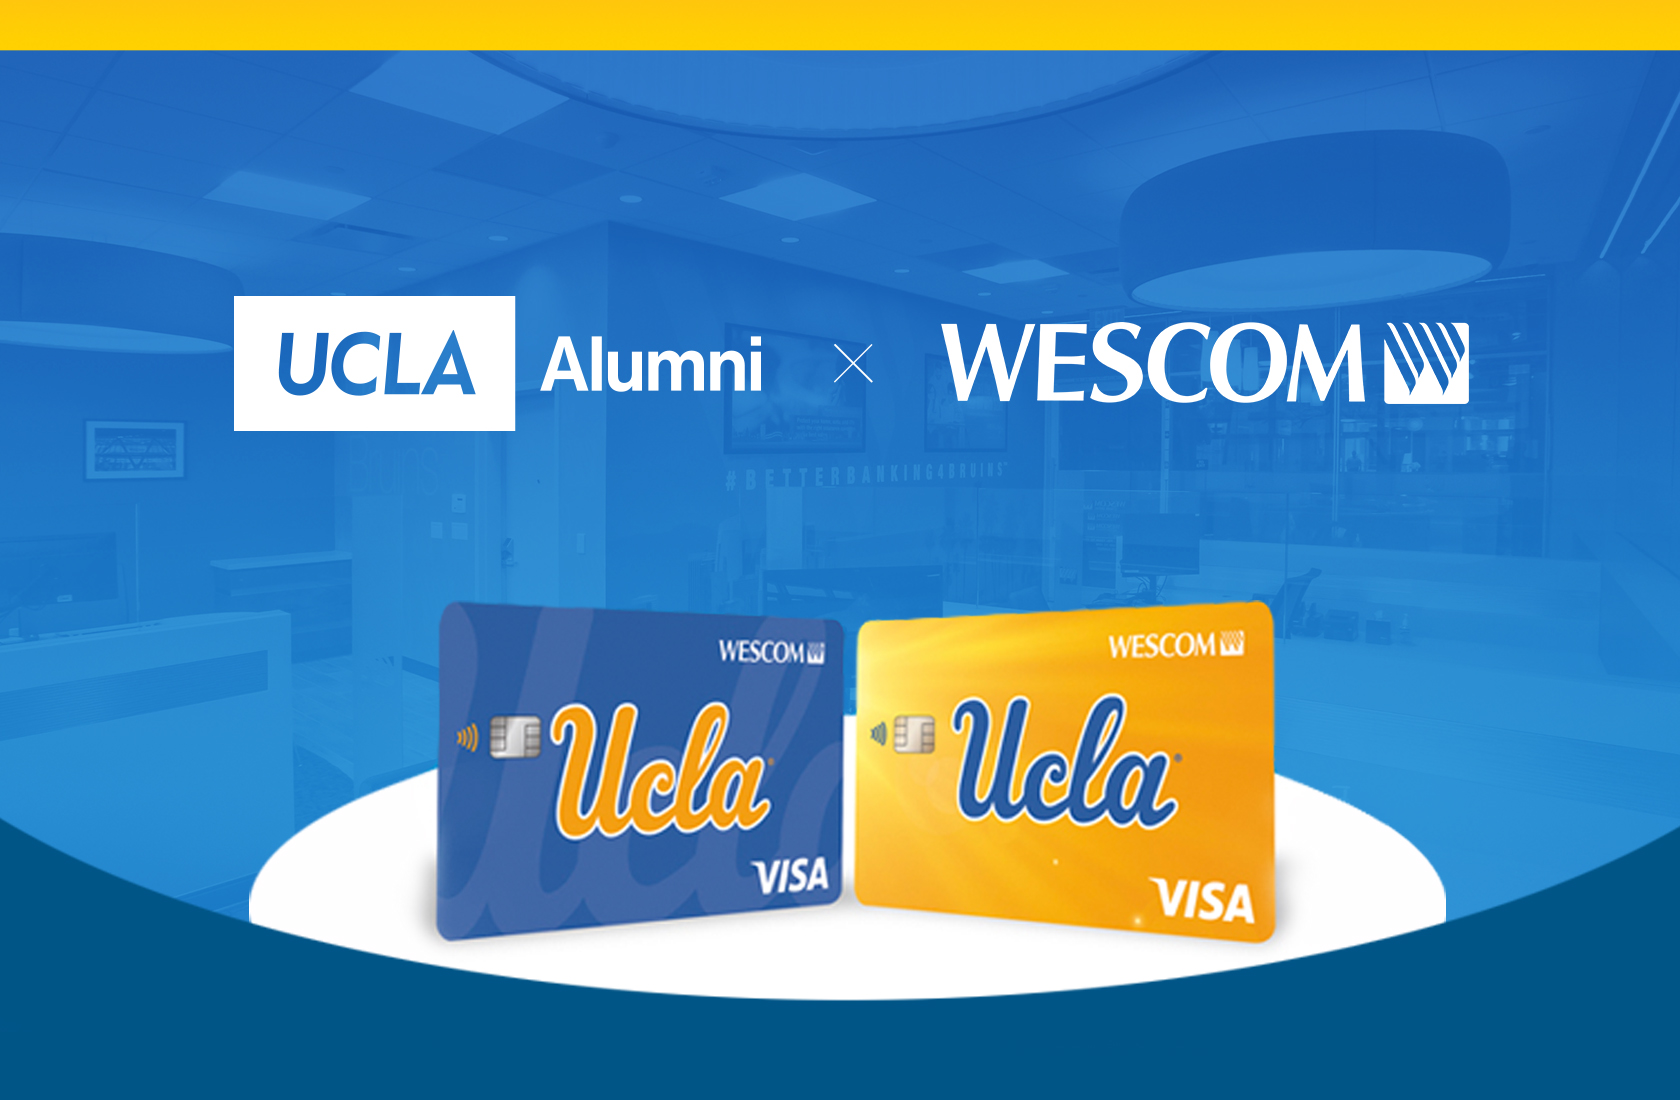 The new UCLA partnership with Wescom, displaying Wescom's new UCLA Credit Cards using the UCLA script athletics logo.